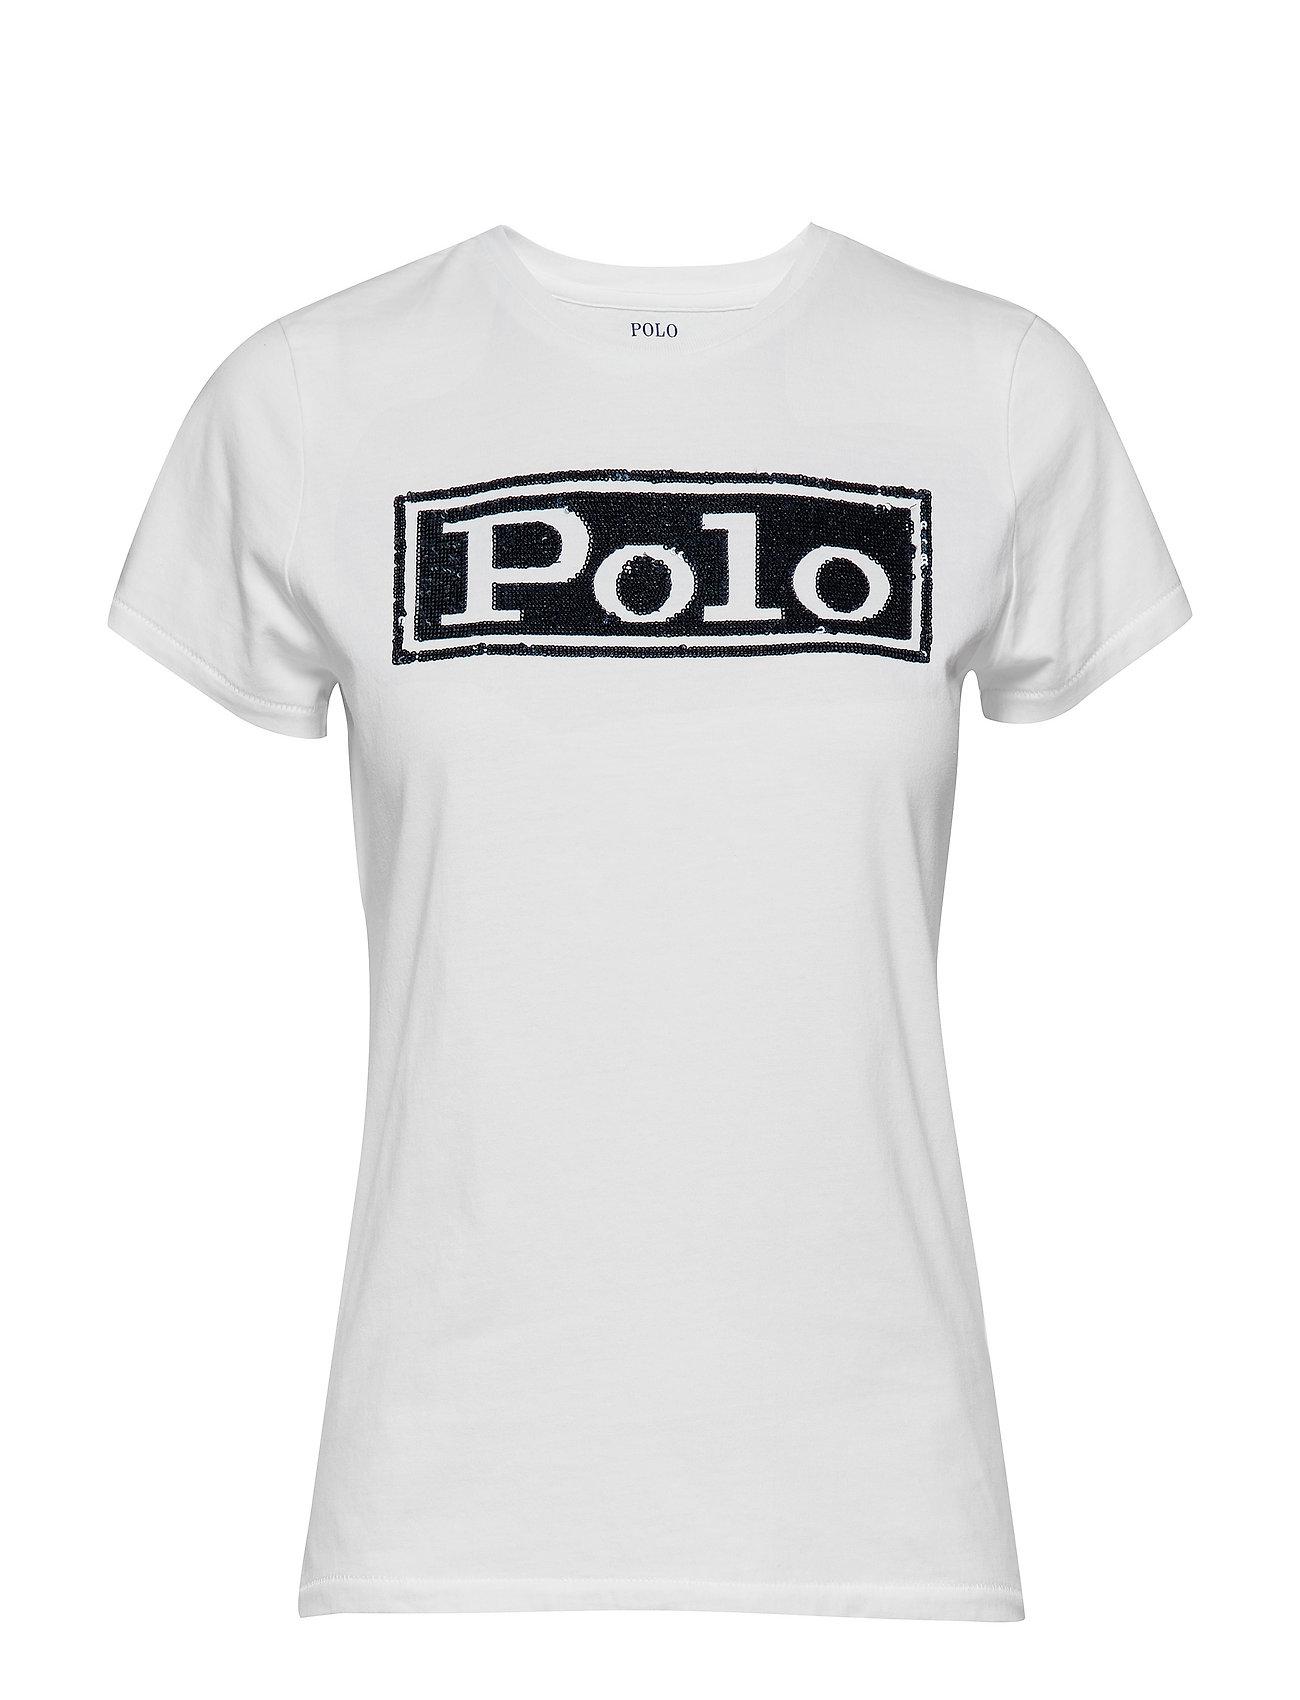 Polo Ralph Lauren 30/1 COTTON JRSY-SSL-KNT - WHITE